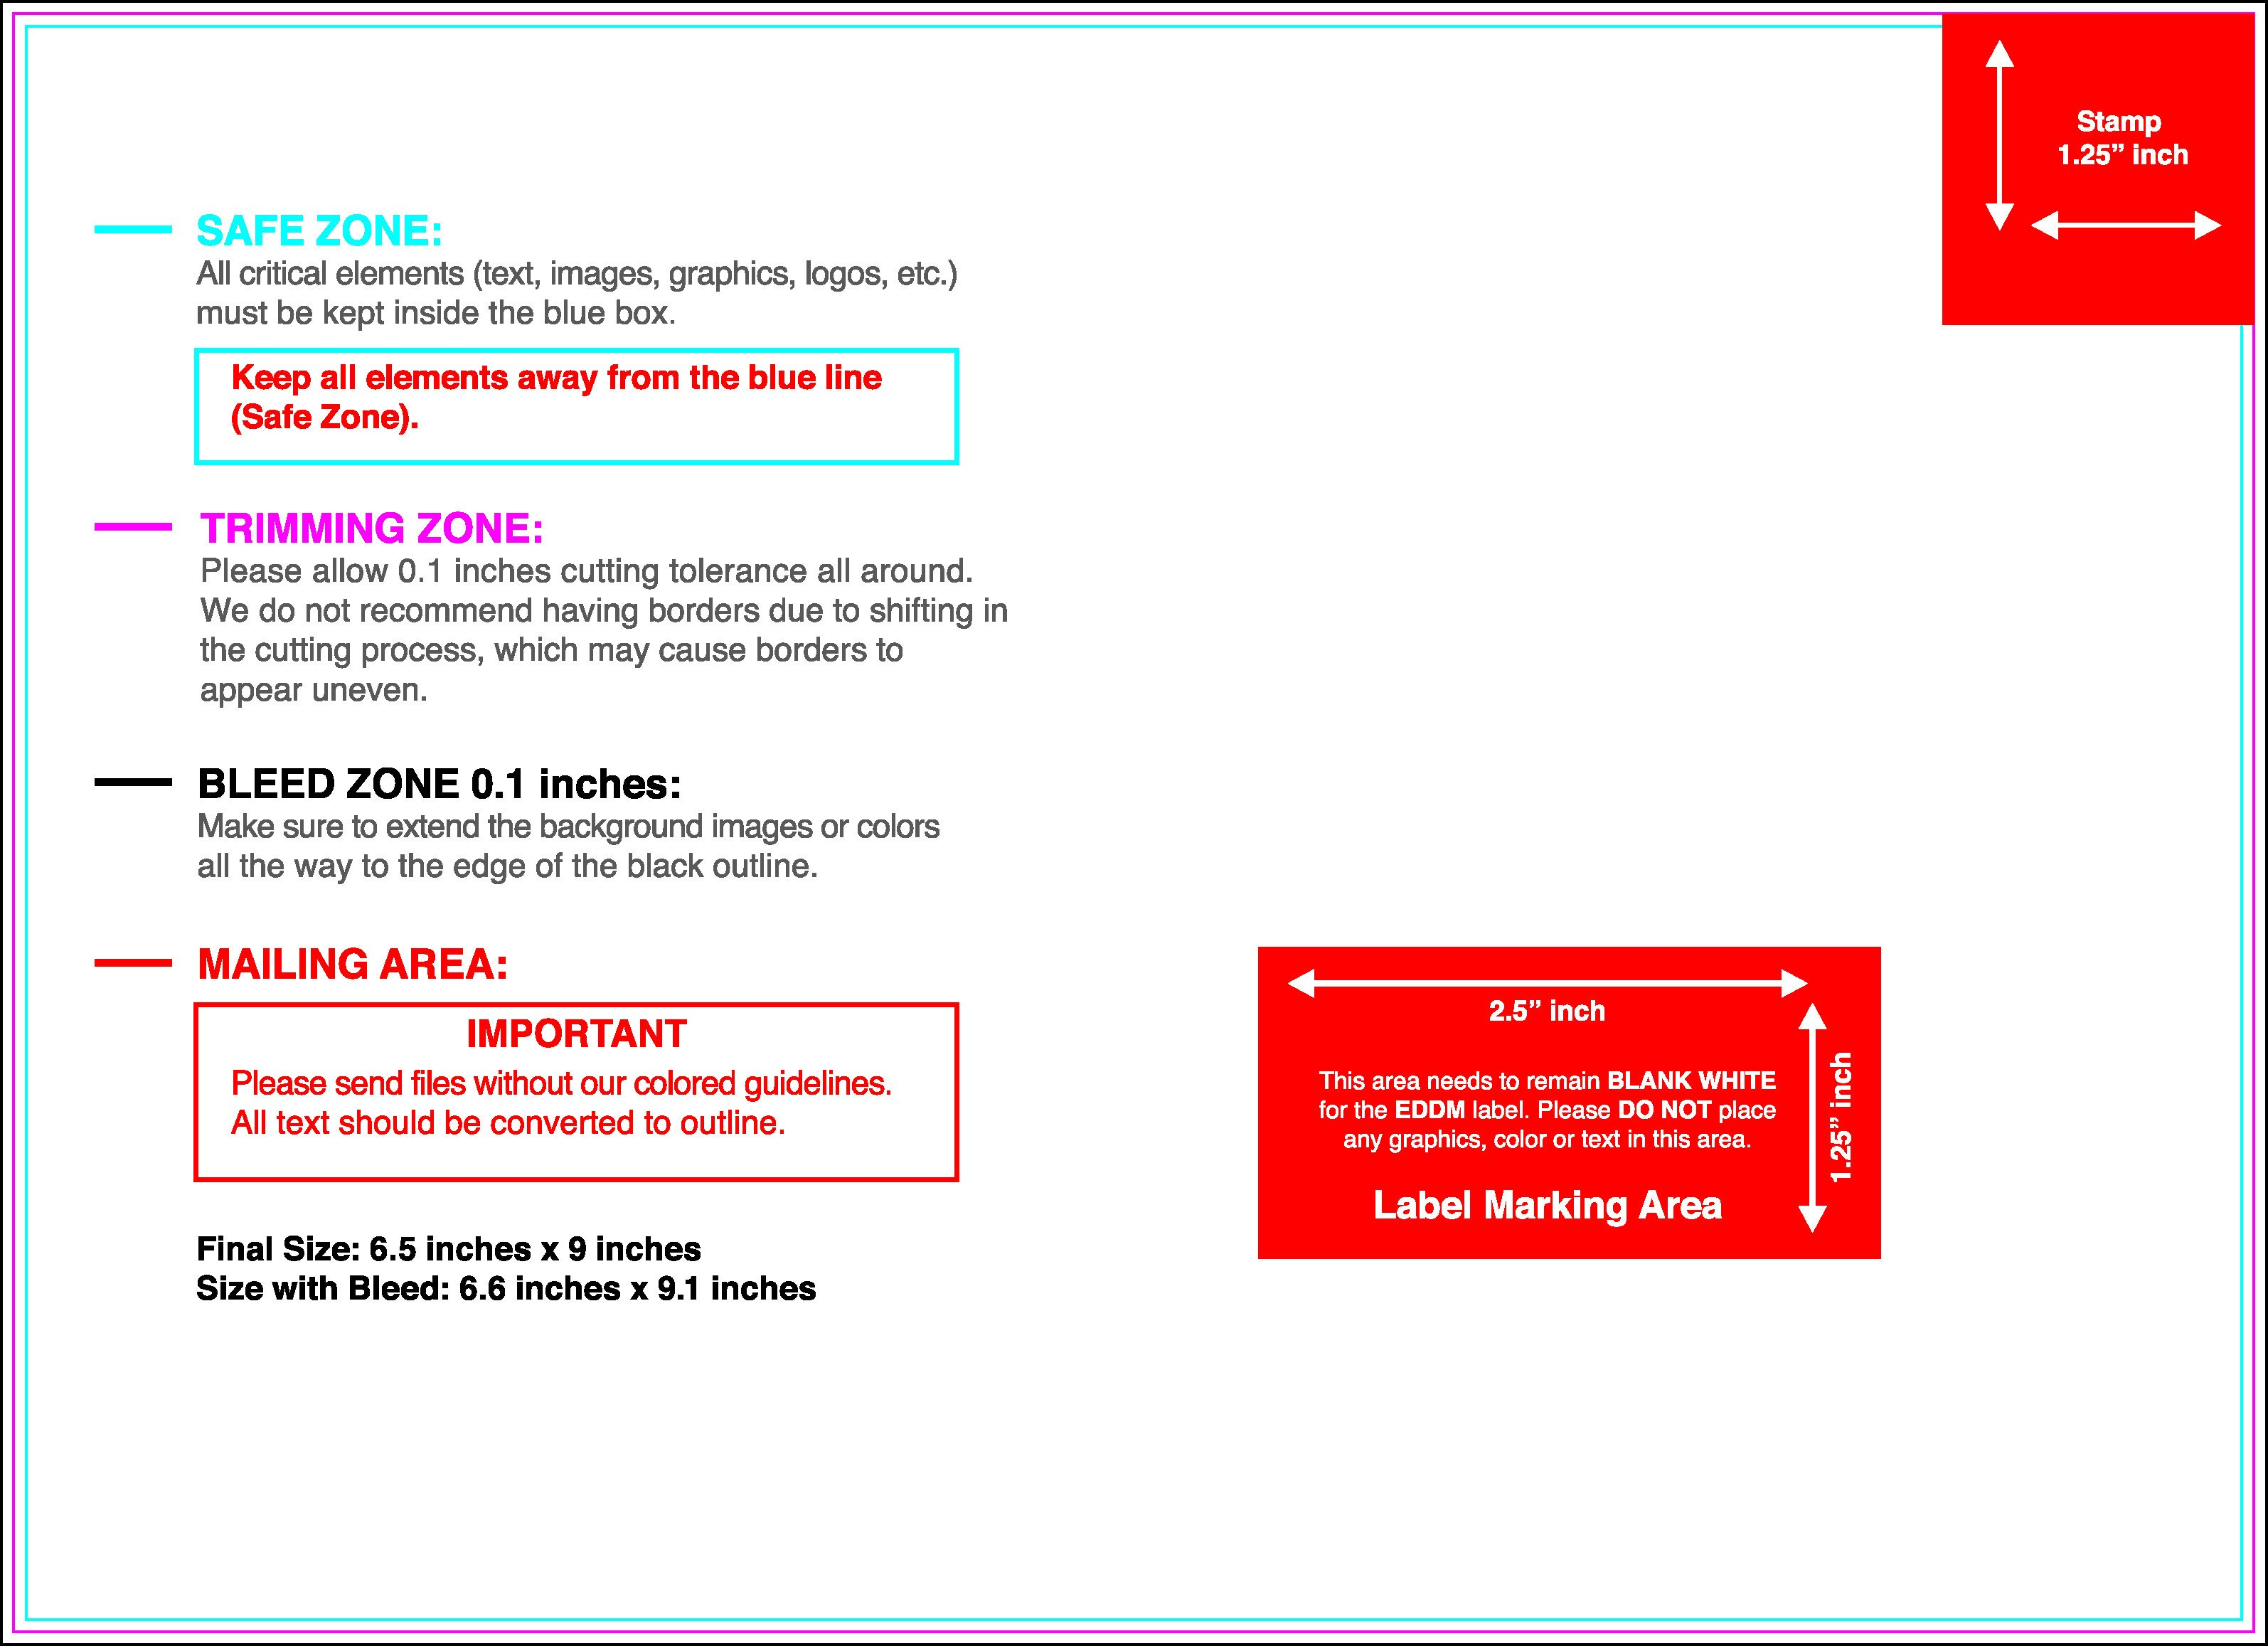 6 X 9 Postcard Template Cutthroat Printprint Your Postcards at Cutthroat Print